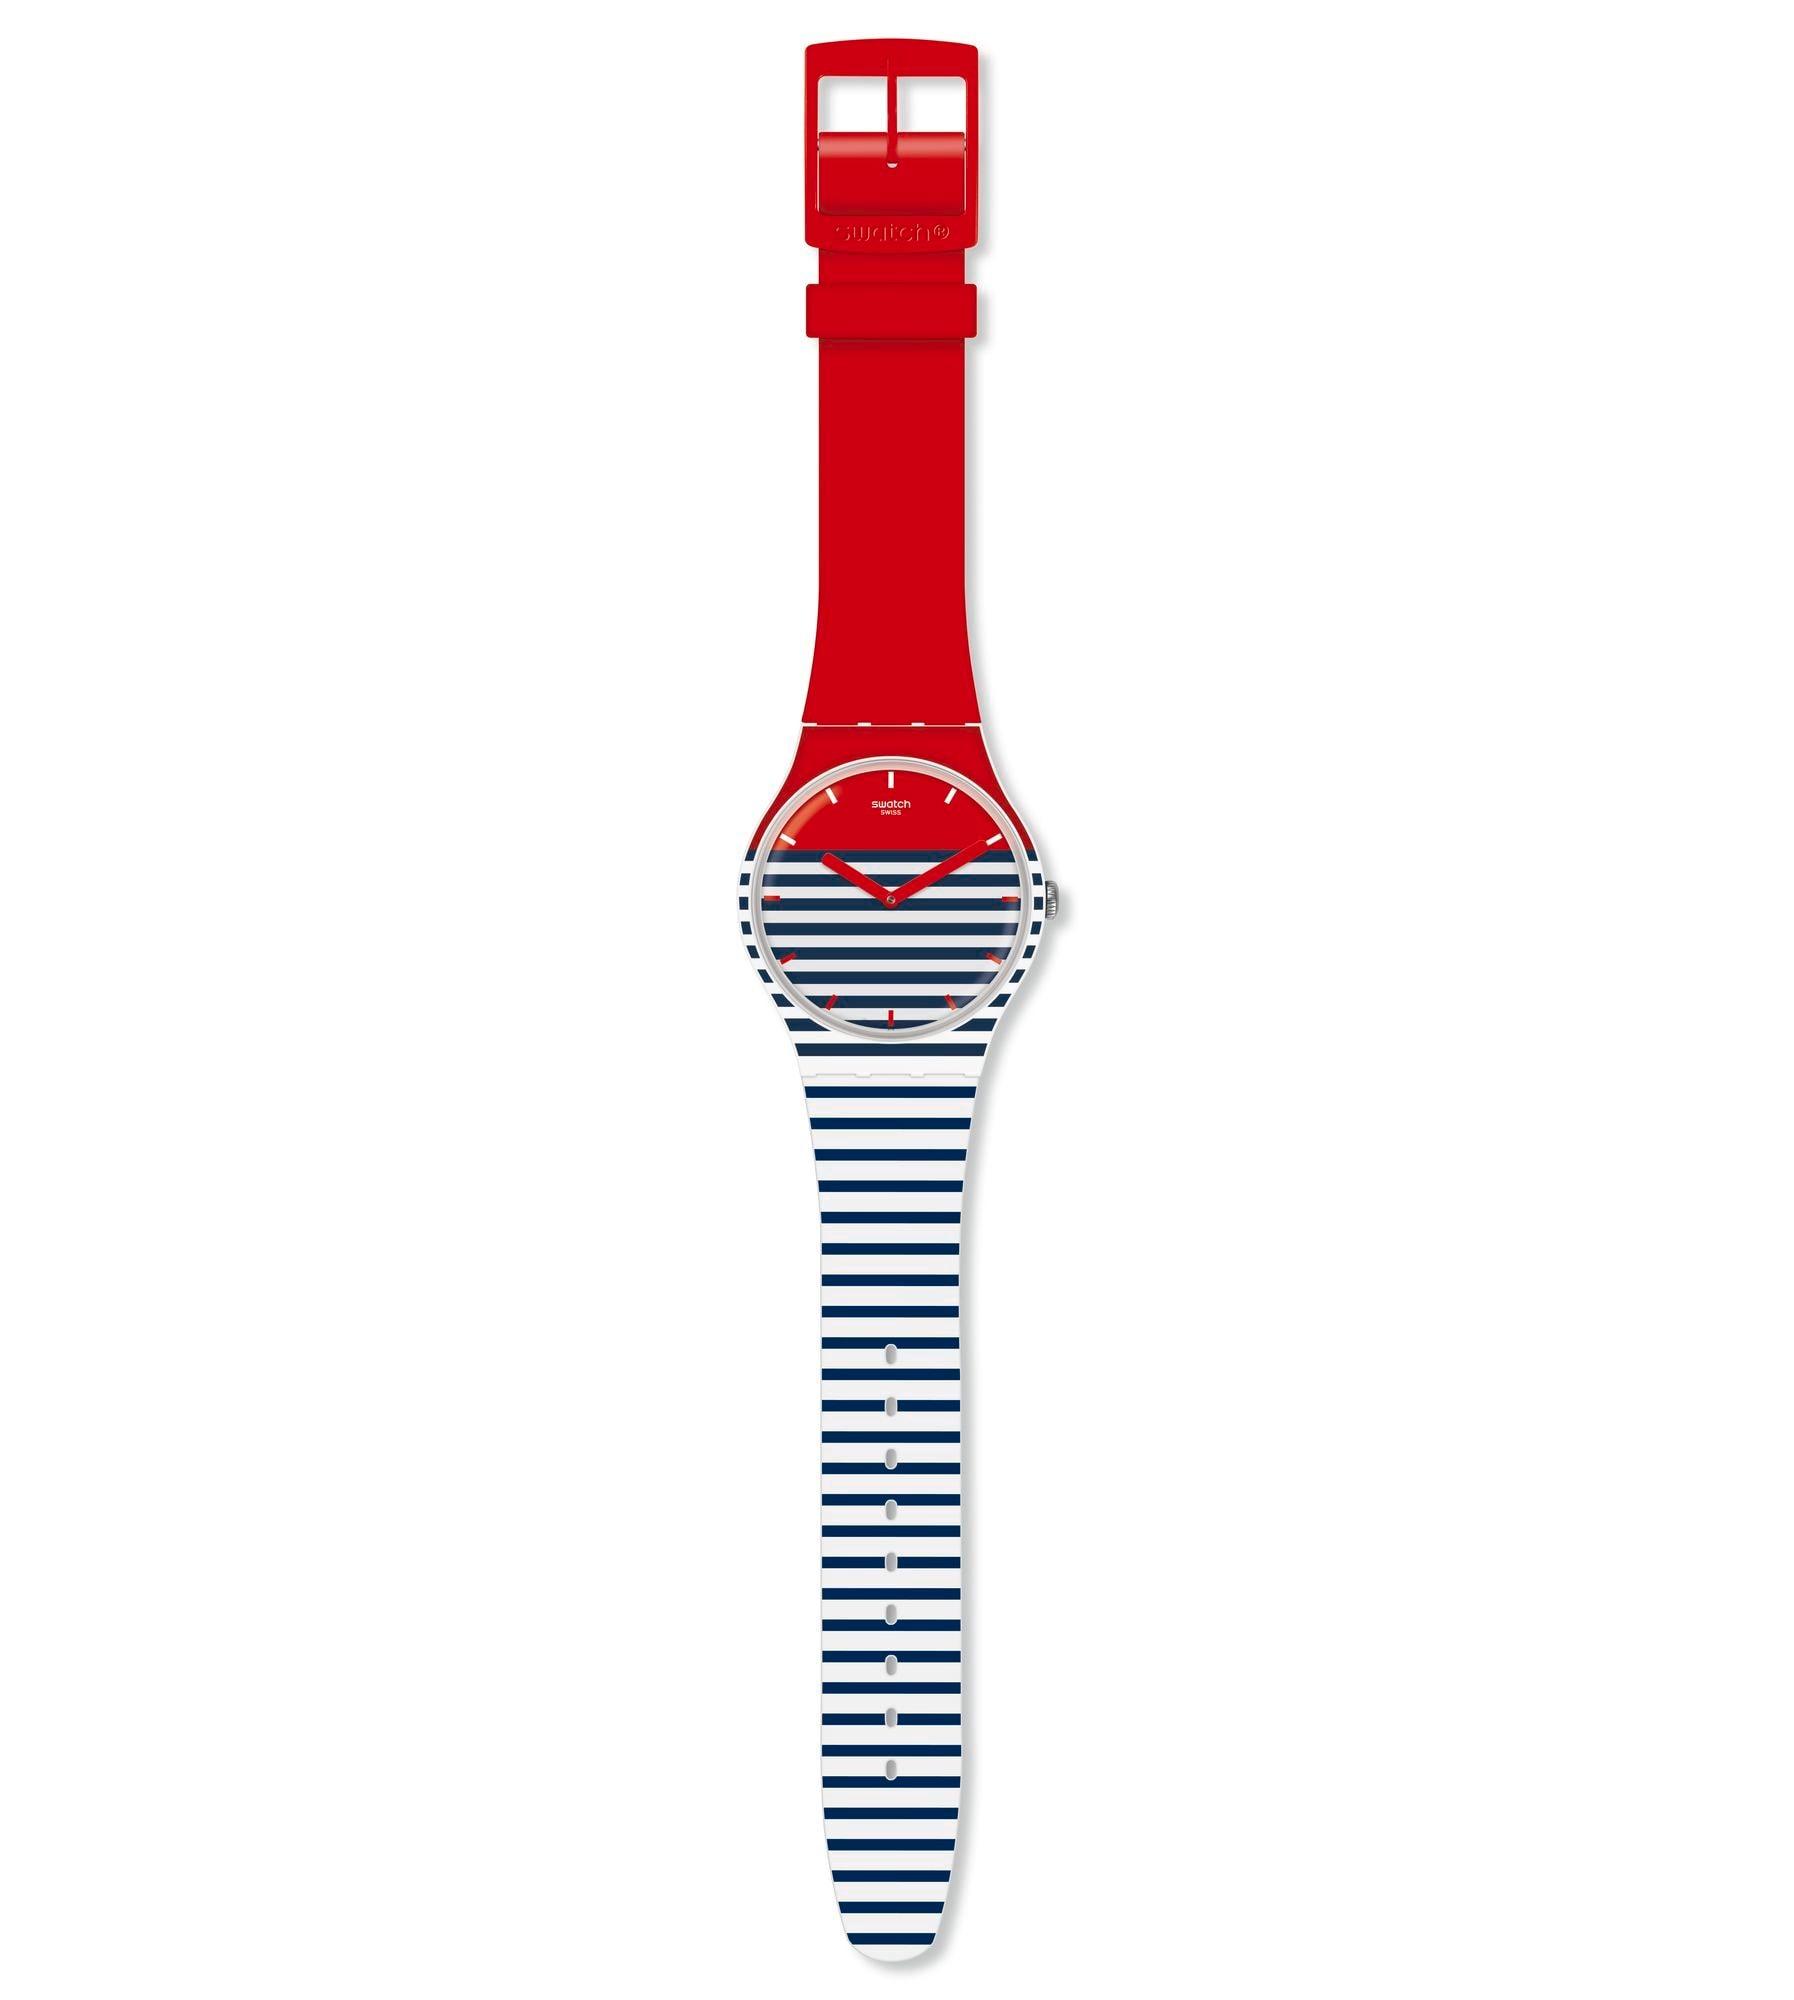 70834b562071 Swatch® México - New Gent (Ø 41 MM) MAGLIETTA SUOW140